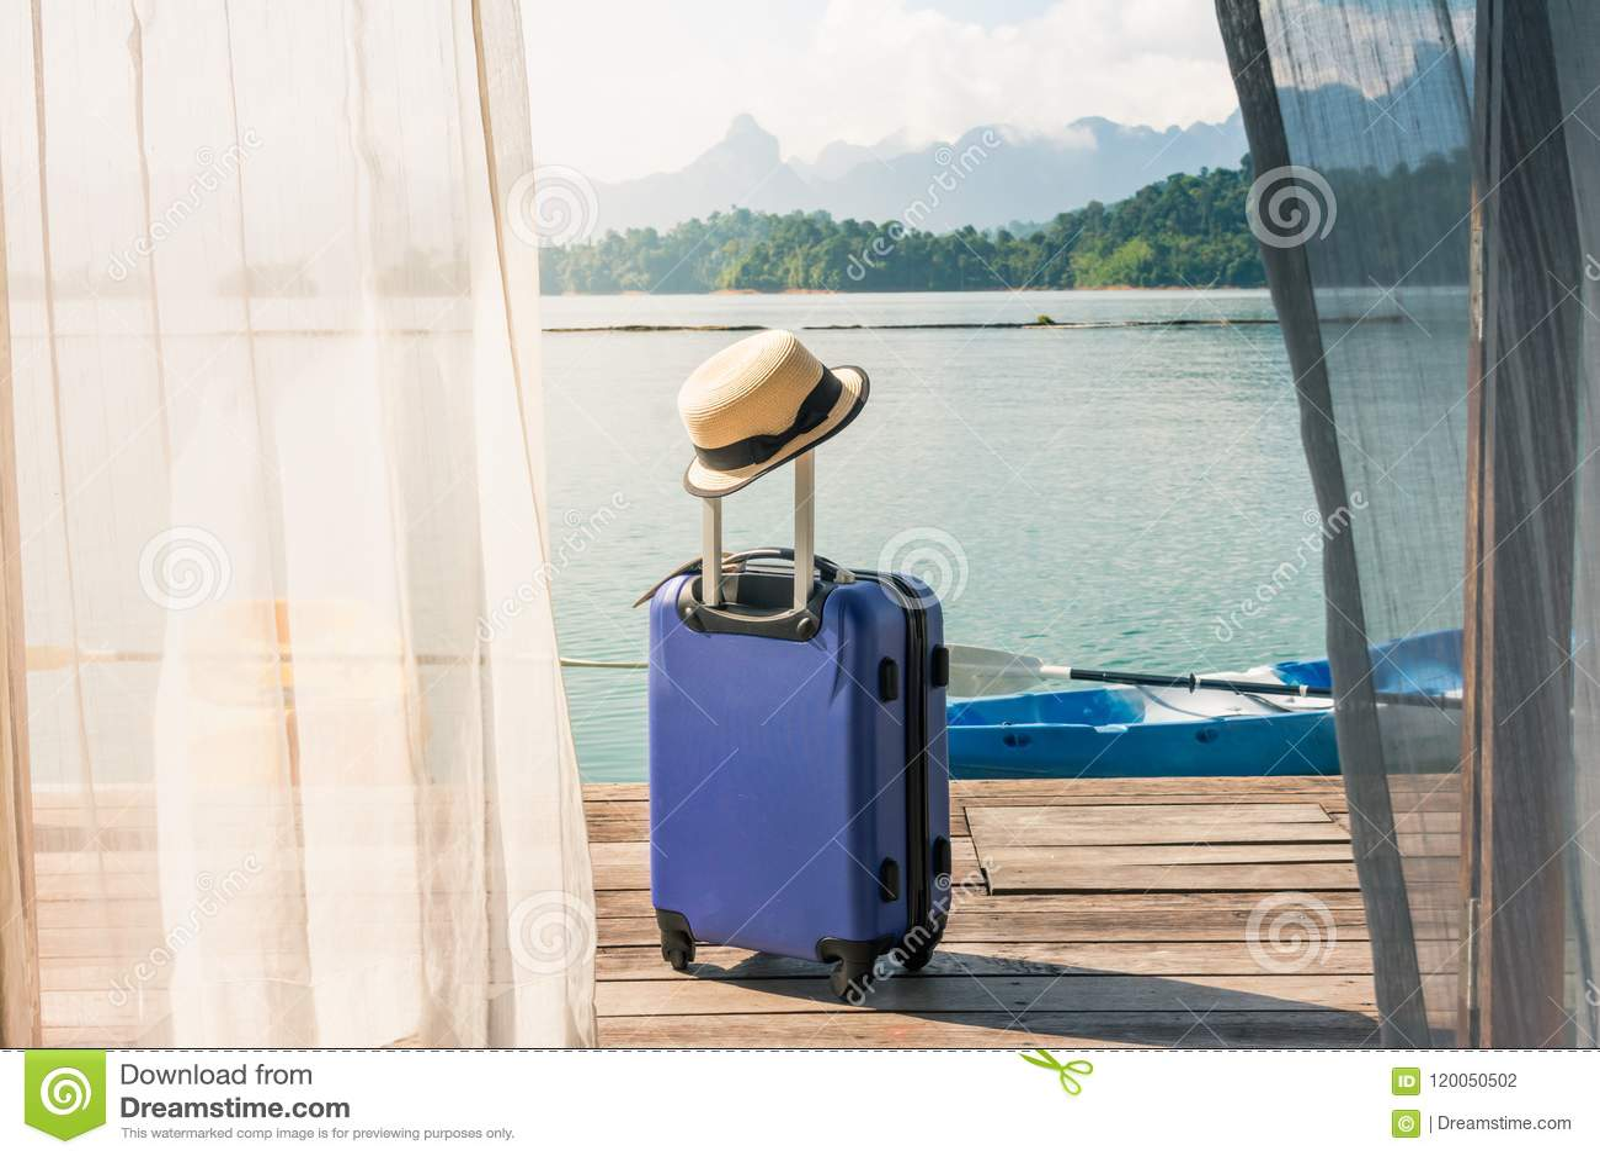 Mening van slaapkamer met venstergordijn en reiskoffer met hoed